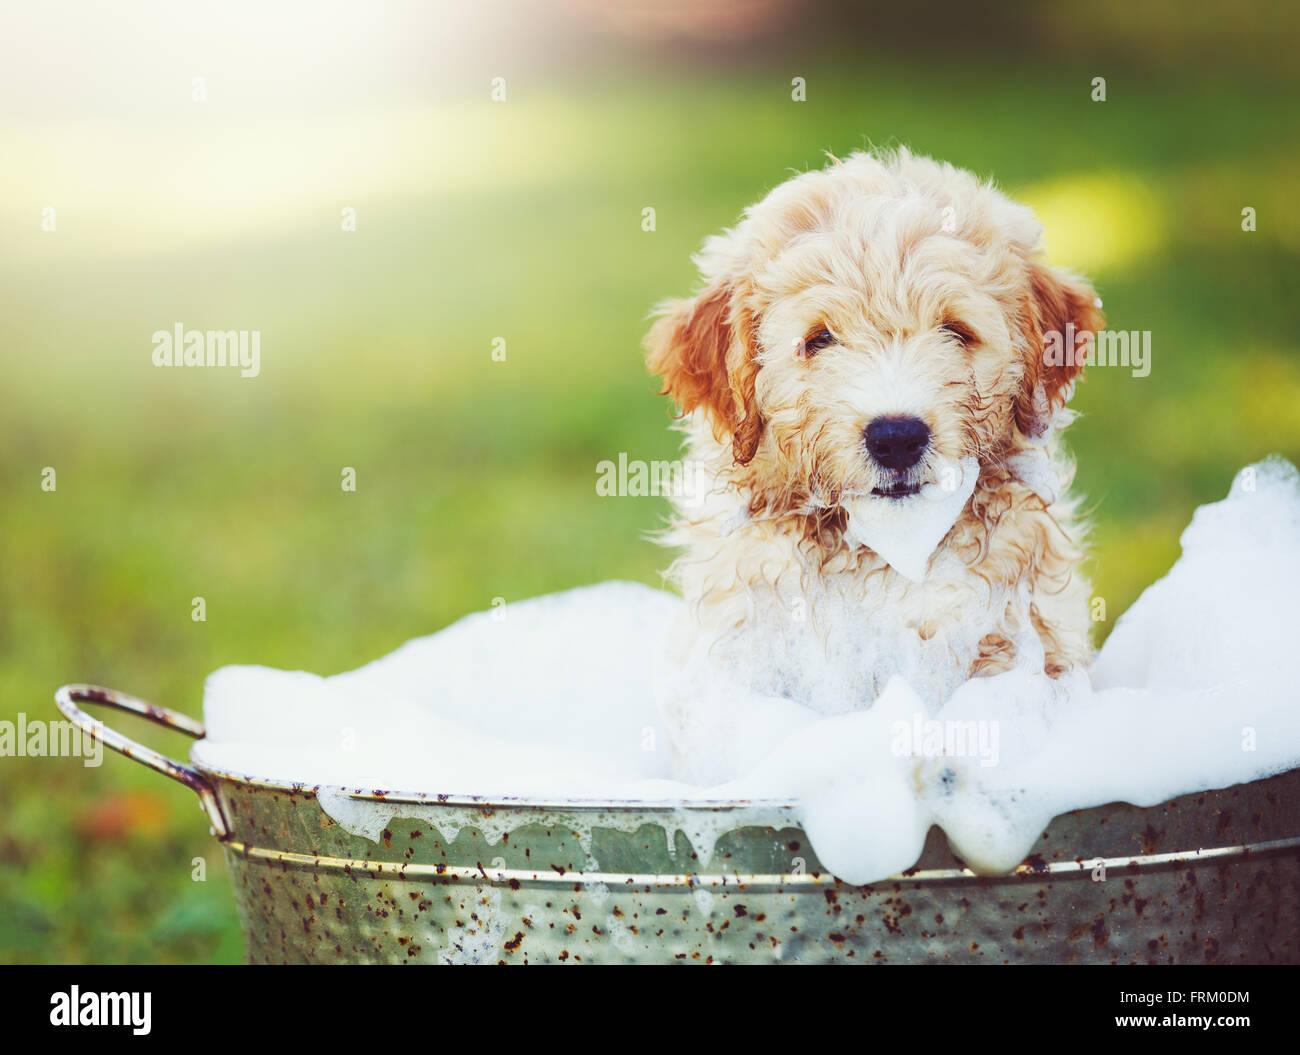 Adorable Cute Puppy Golden Retriever Puppy Taking A Bubble Bath Stock Photo Alamy